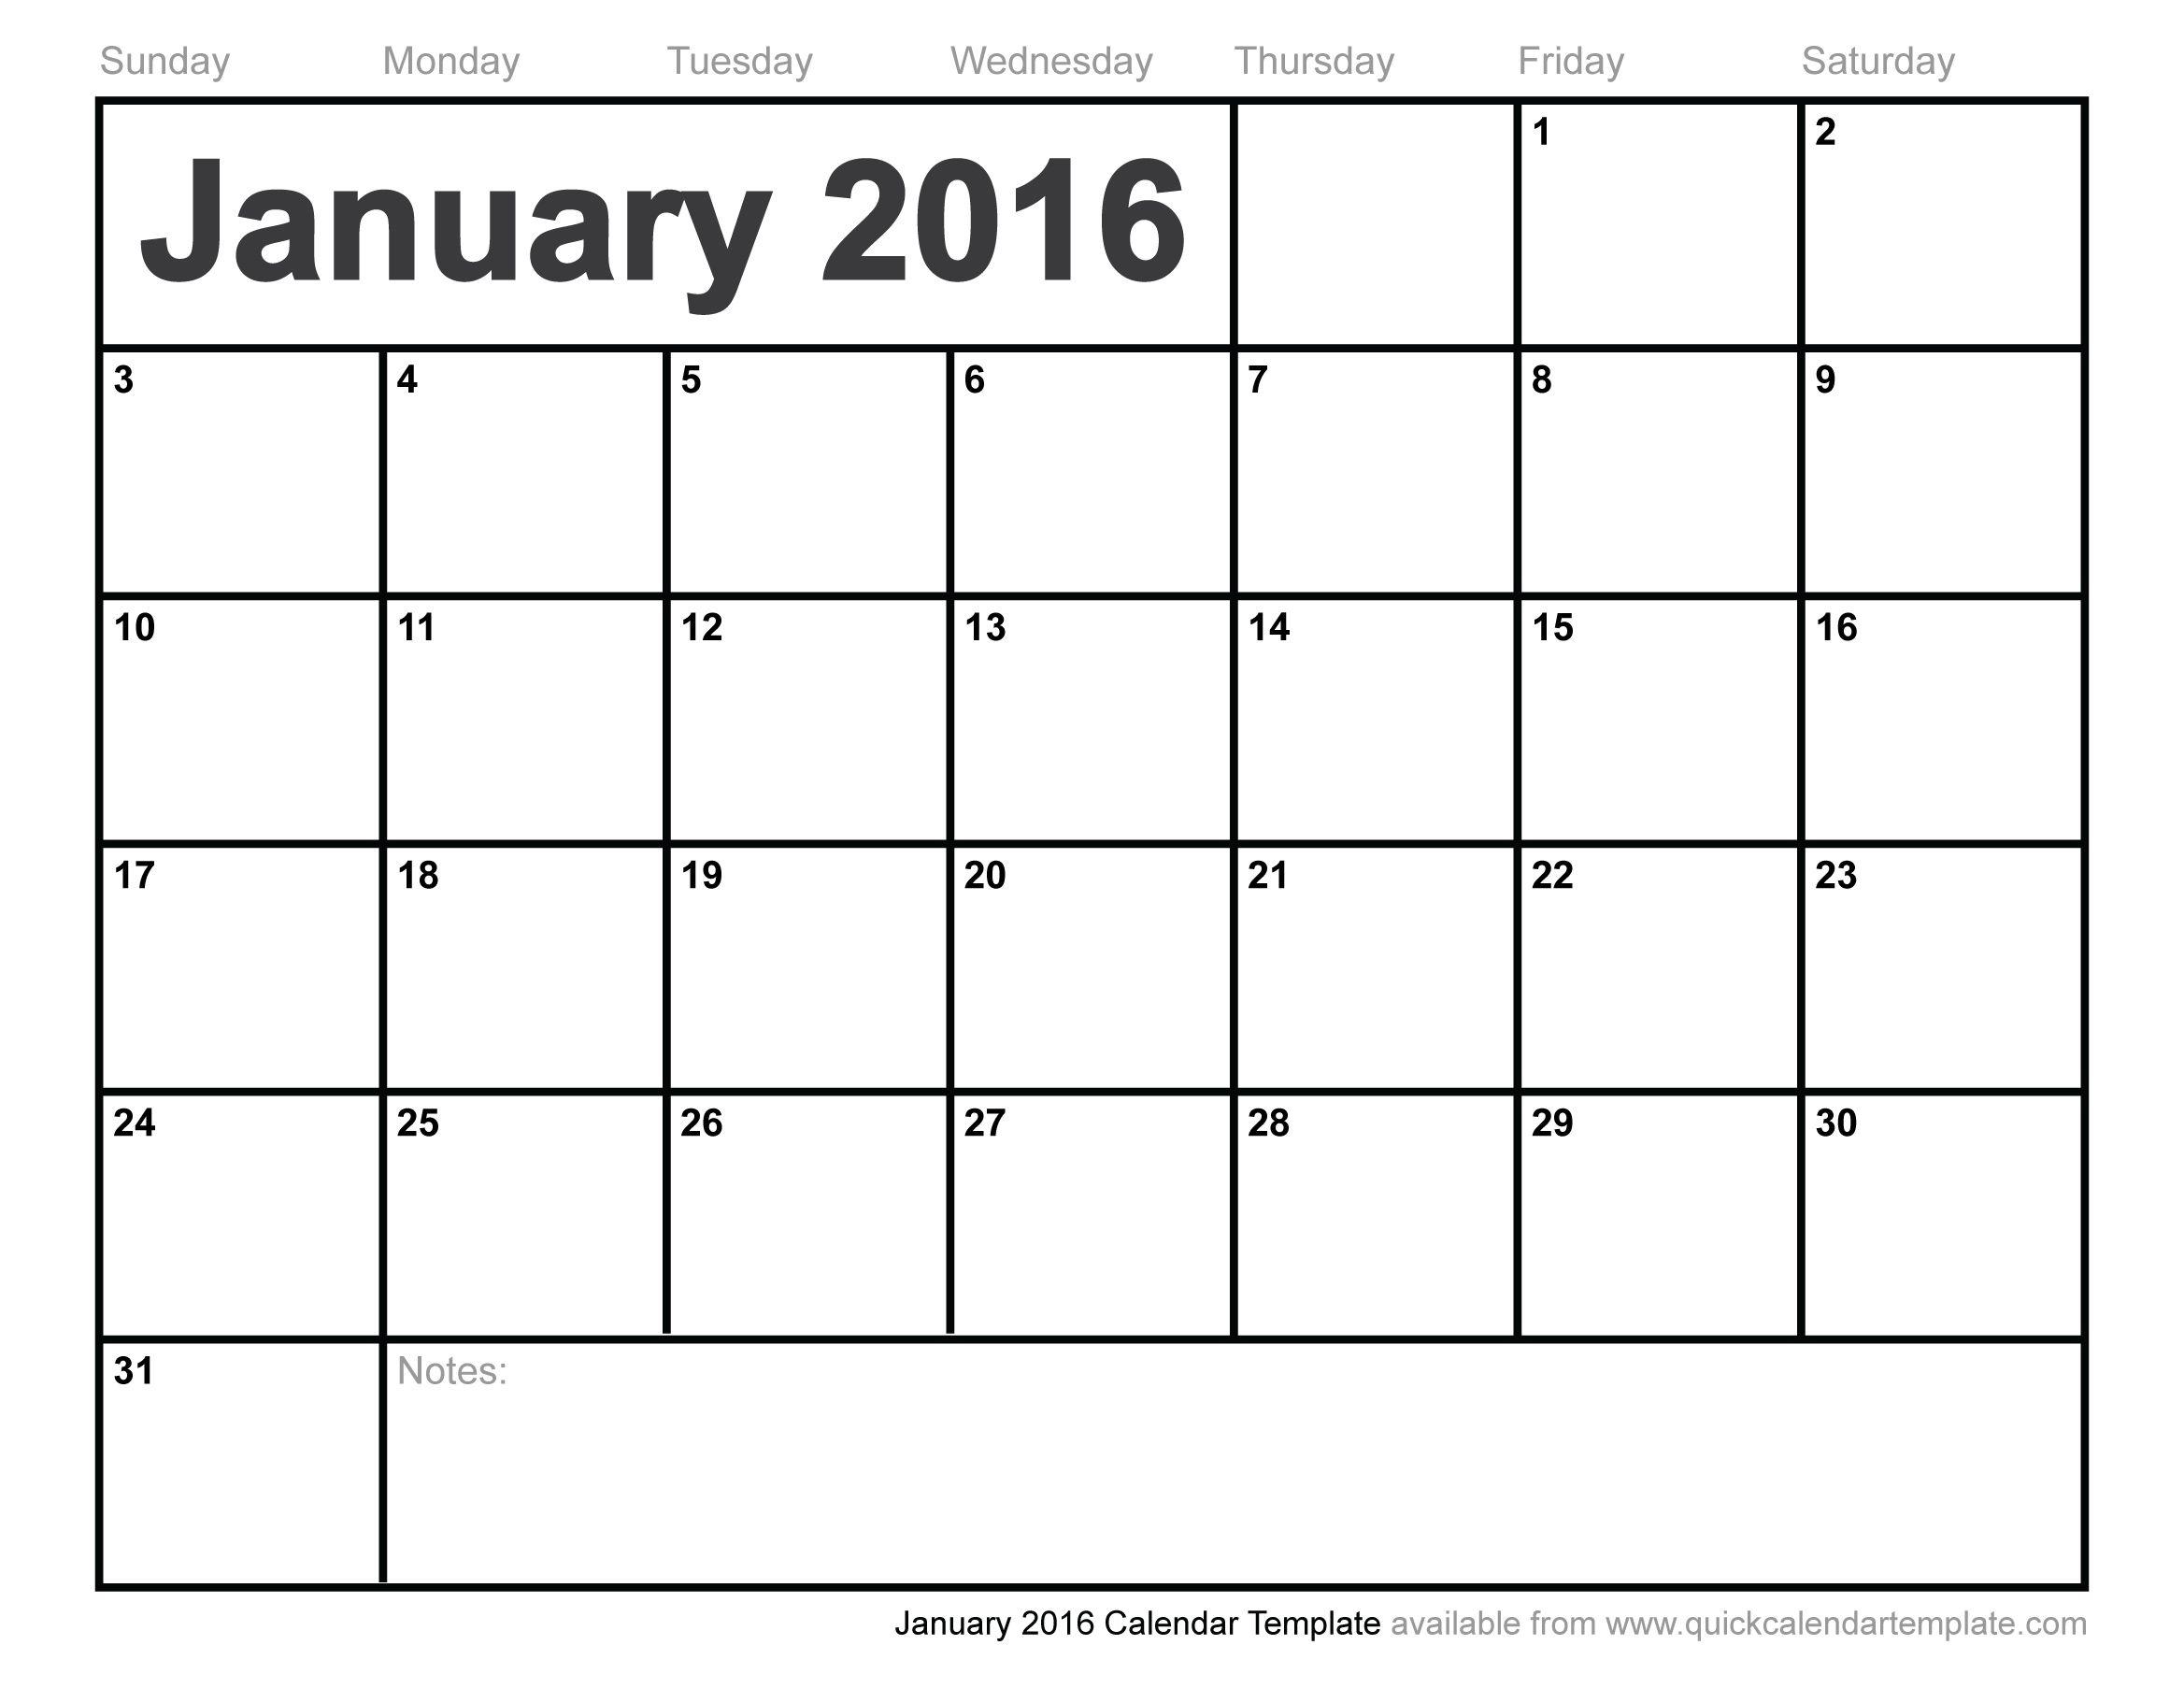 Calendar Template Excel Calendar Template Word Calendar Template Indesign